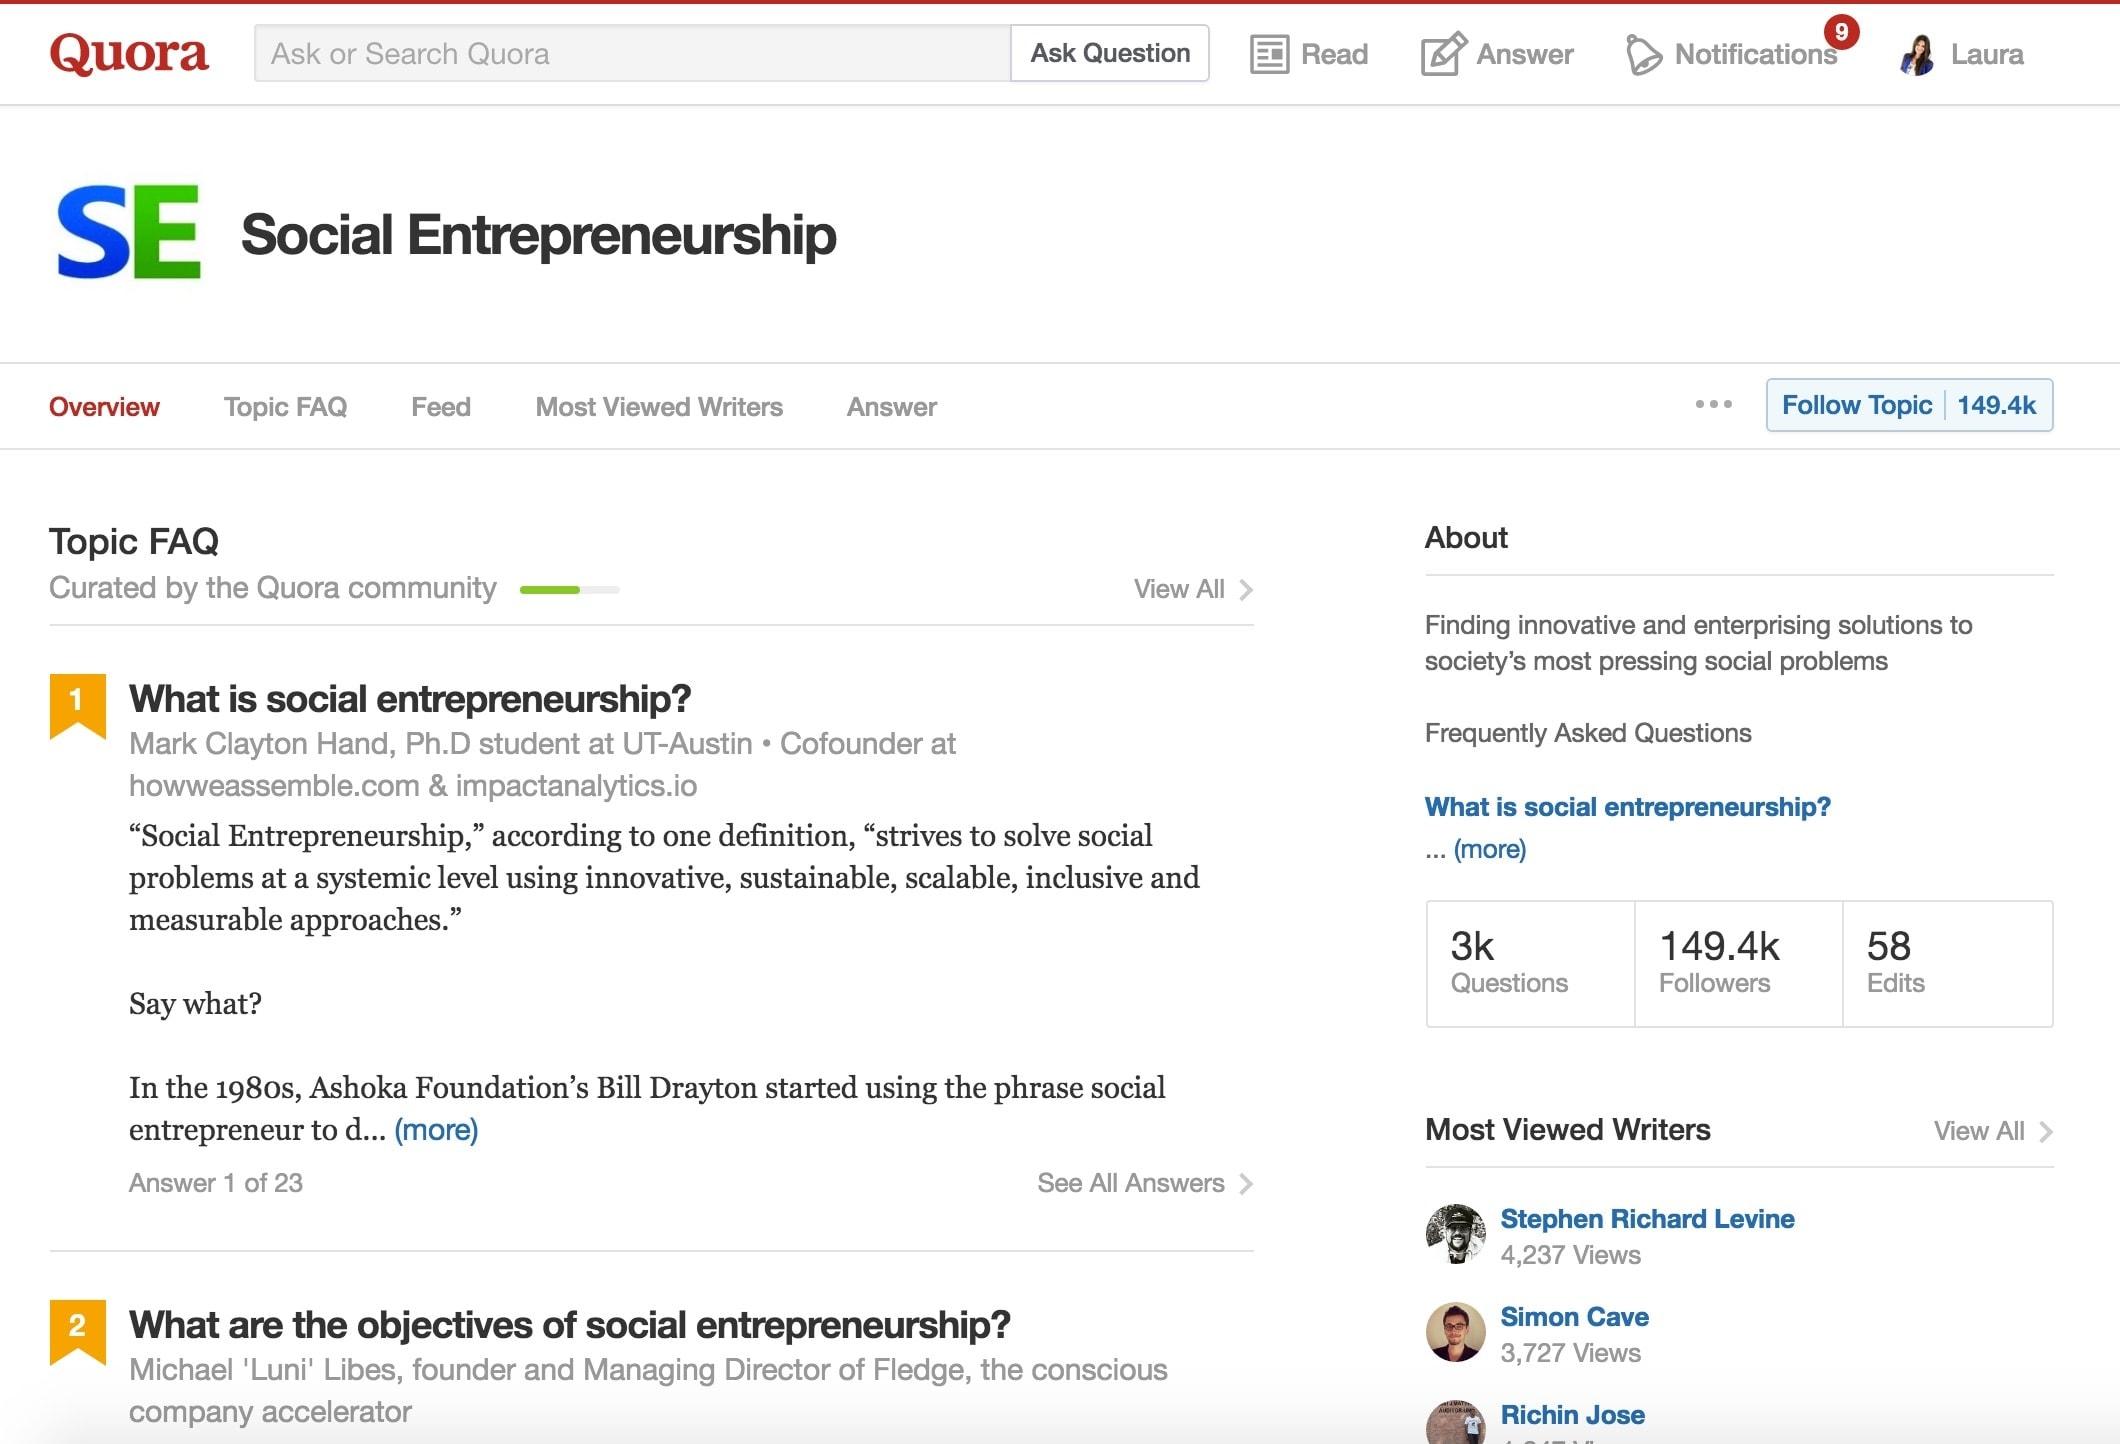 Quora's Social Entrepreneurship Page